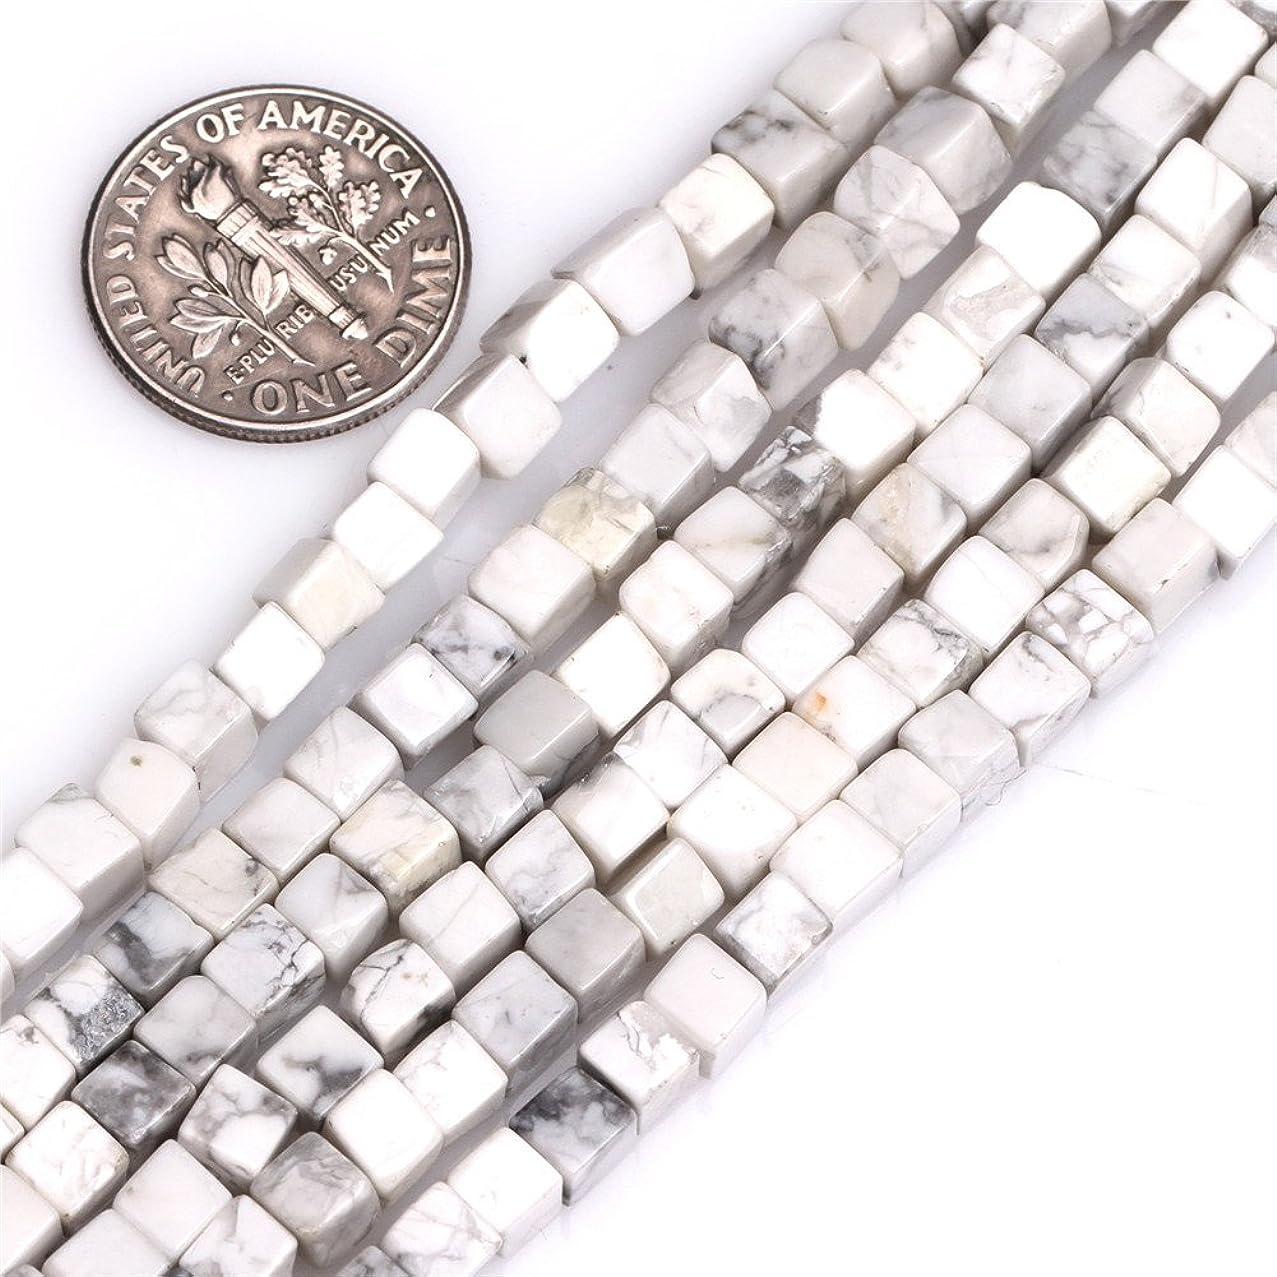 JOE FOREMAN 4mm White Howlite Stone Semi Precious Gemstone Cube Loose Beads for Jewelry Making DIY Handmade Craft Supplies 15